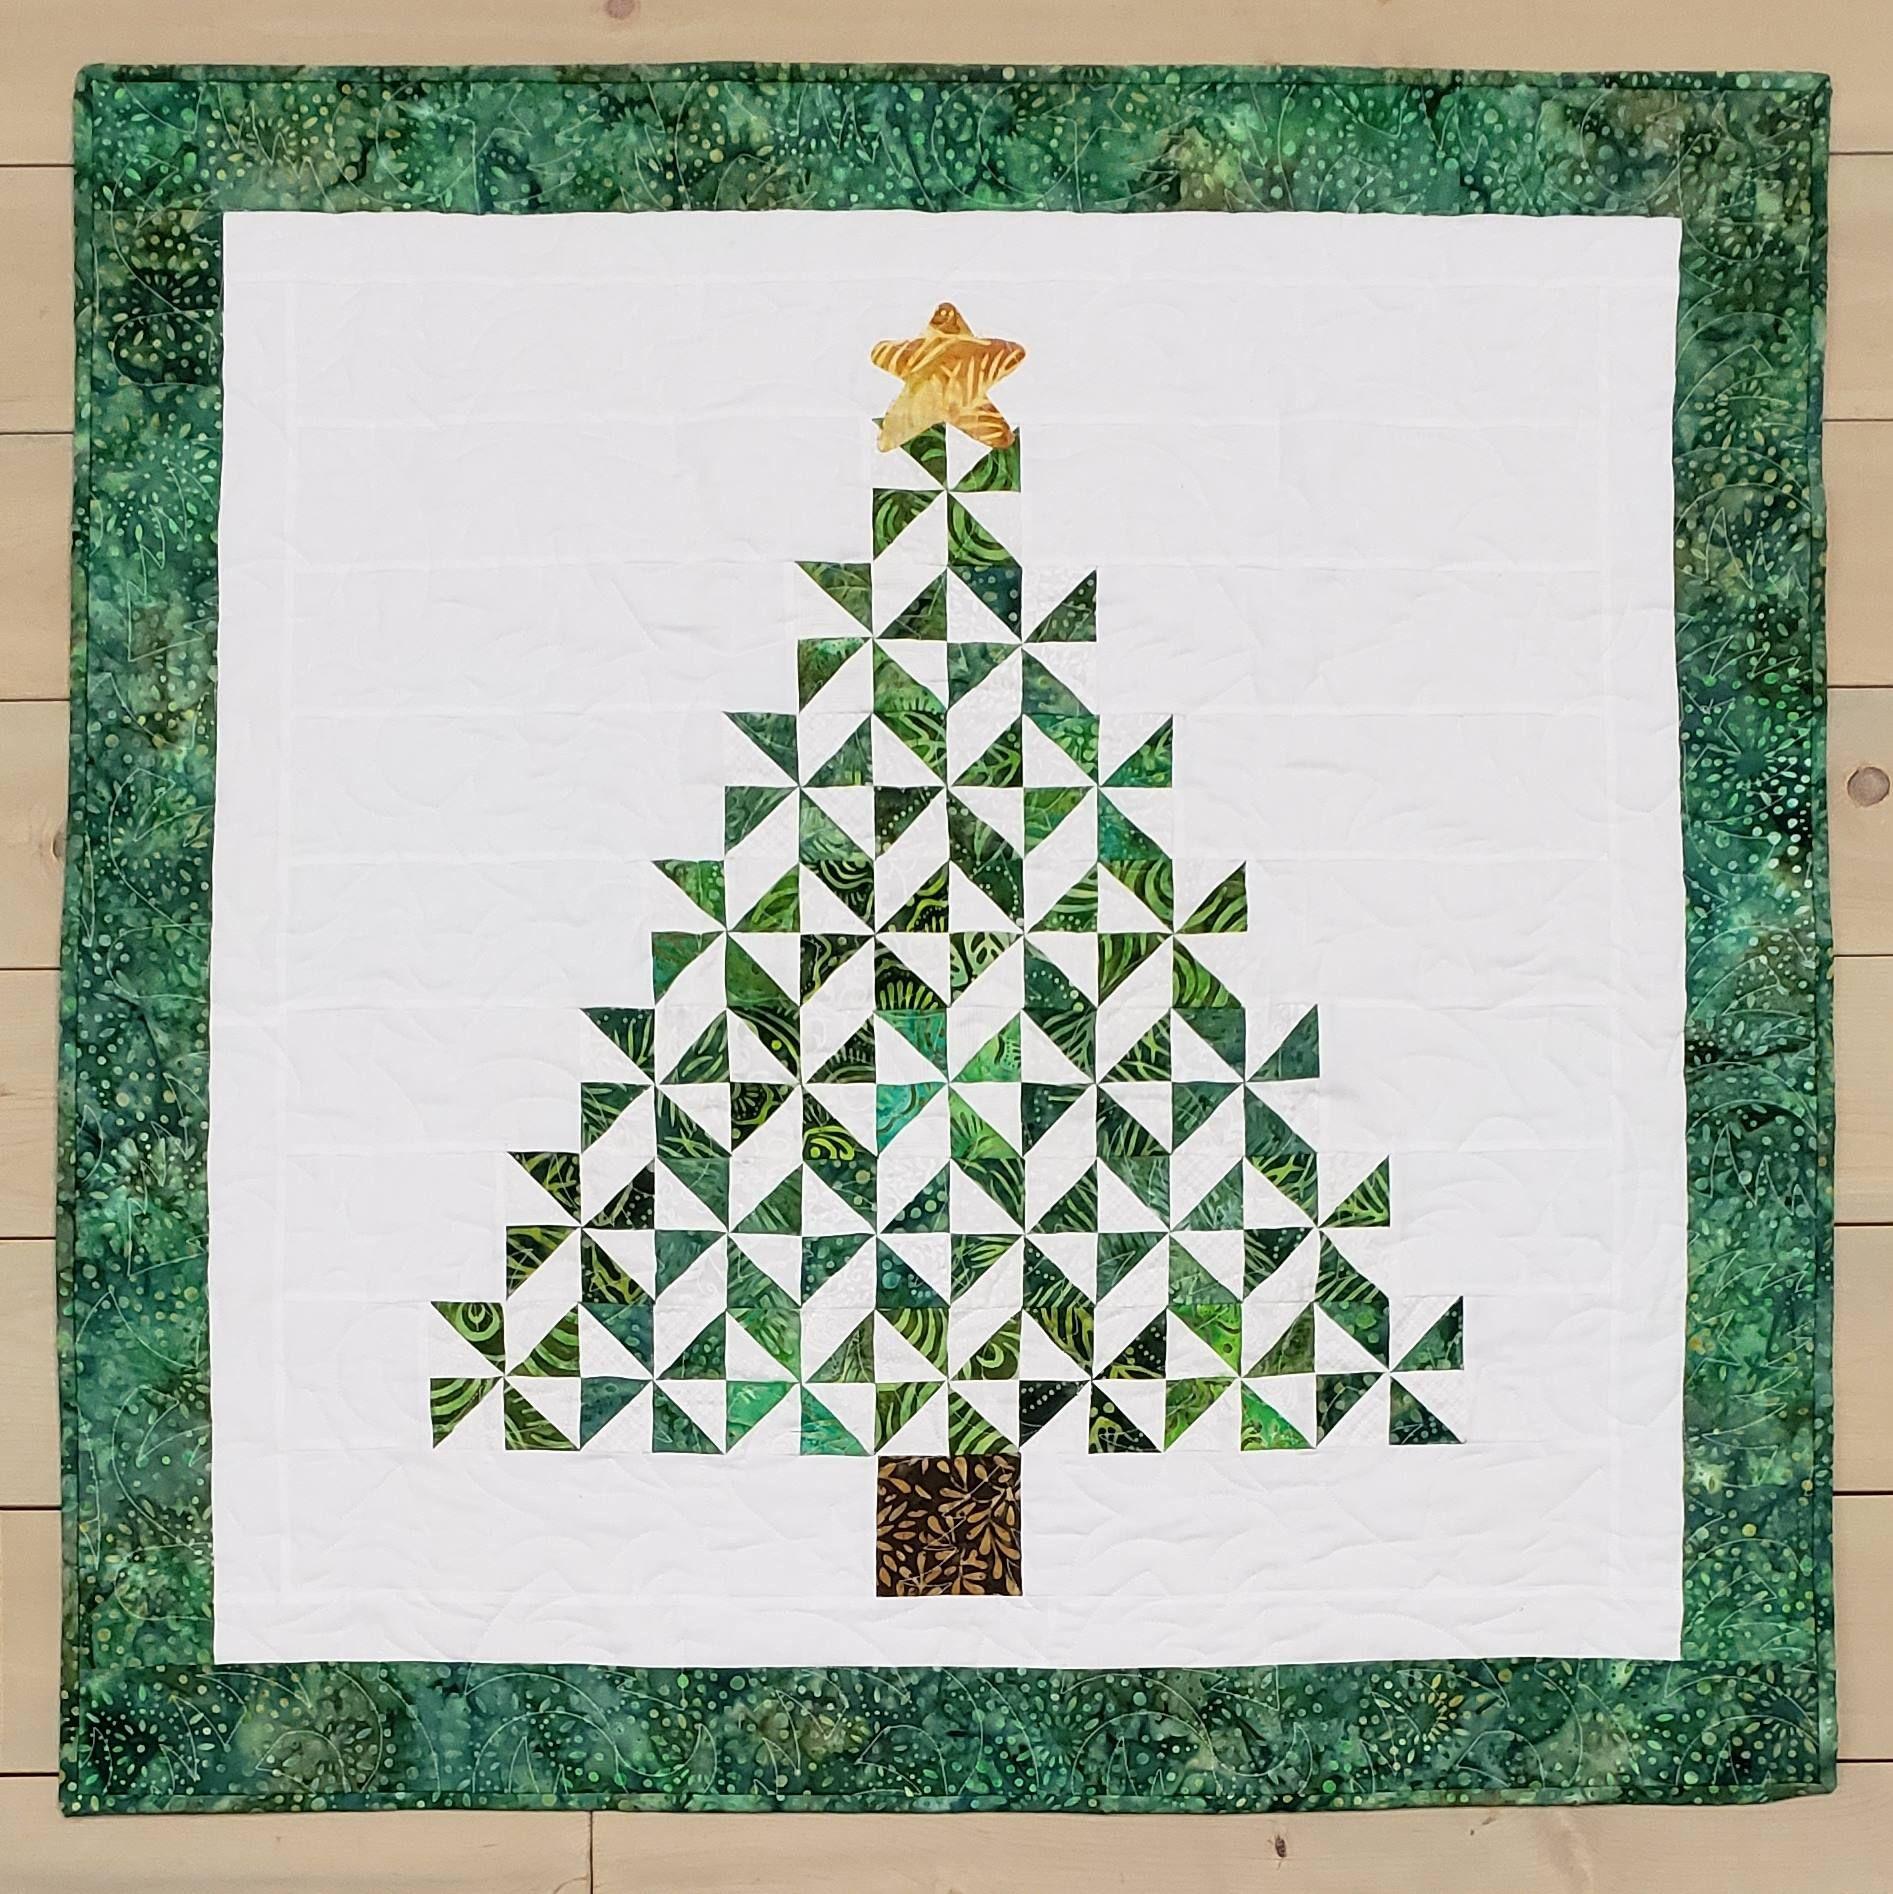 Missouri Star Quilt Video For Pinwheel Christmas Tree Wall Hanging Christmas Tree Quilted Wall Hanging Tree Quilt Pattern Missouri Star Quilt Company